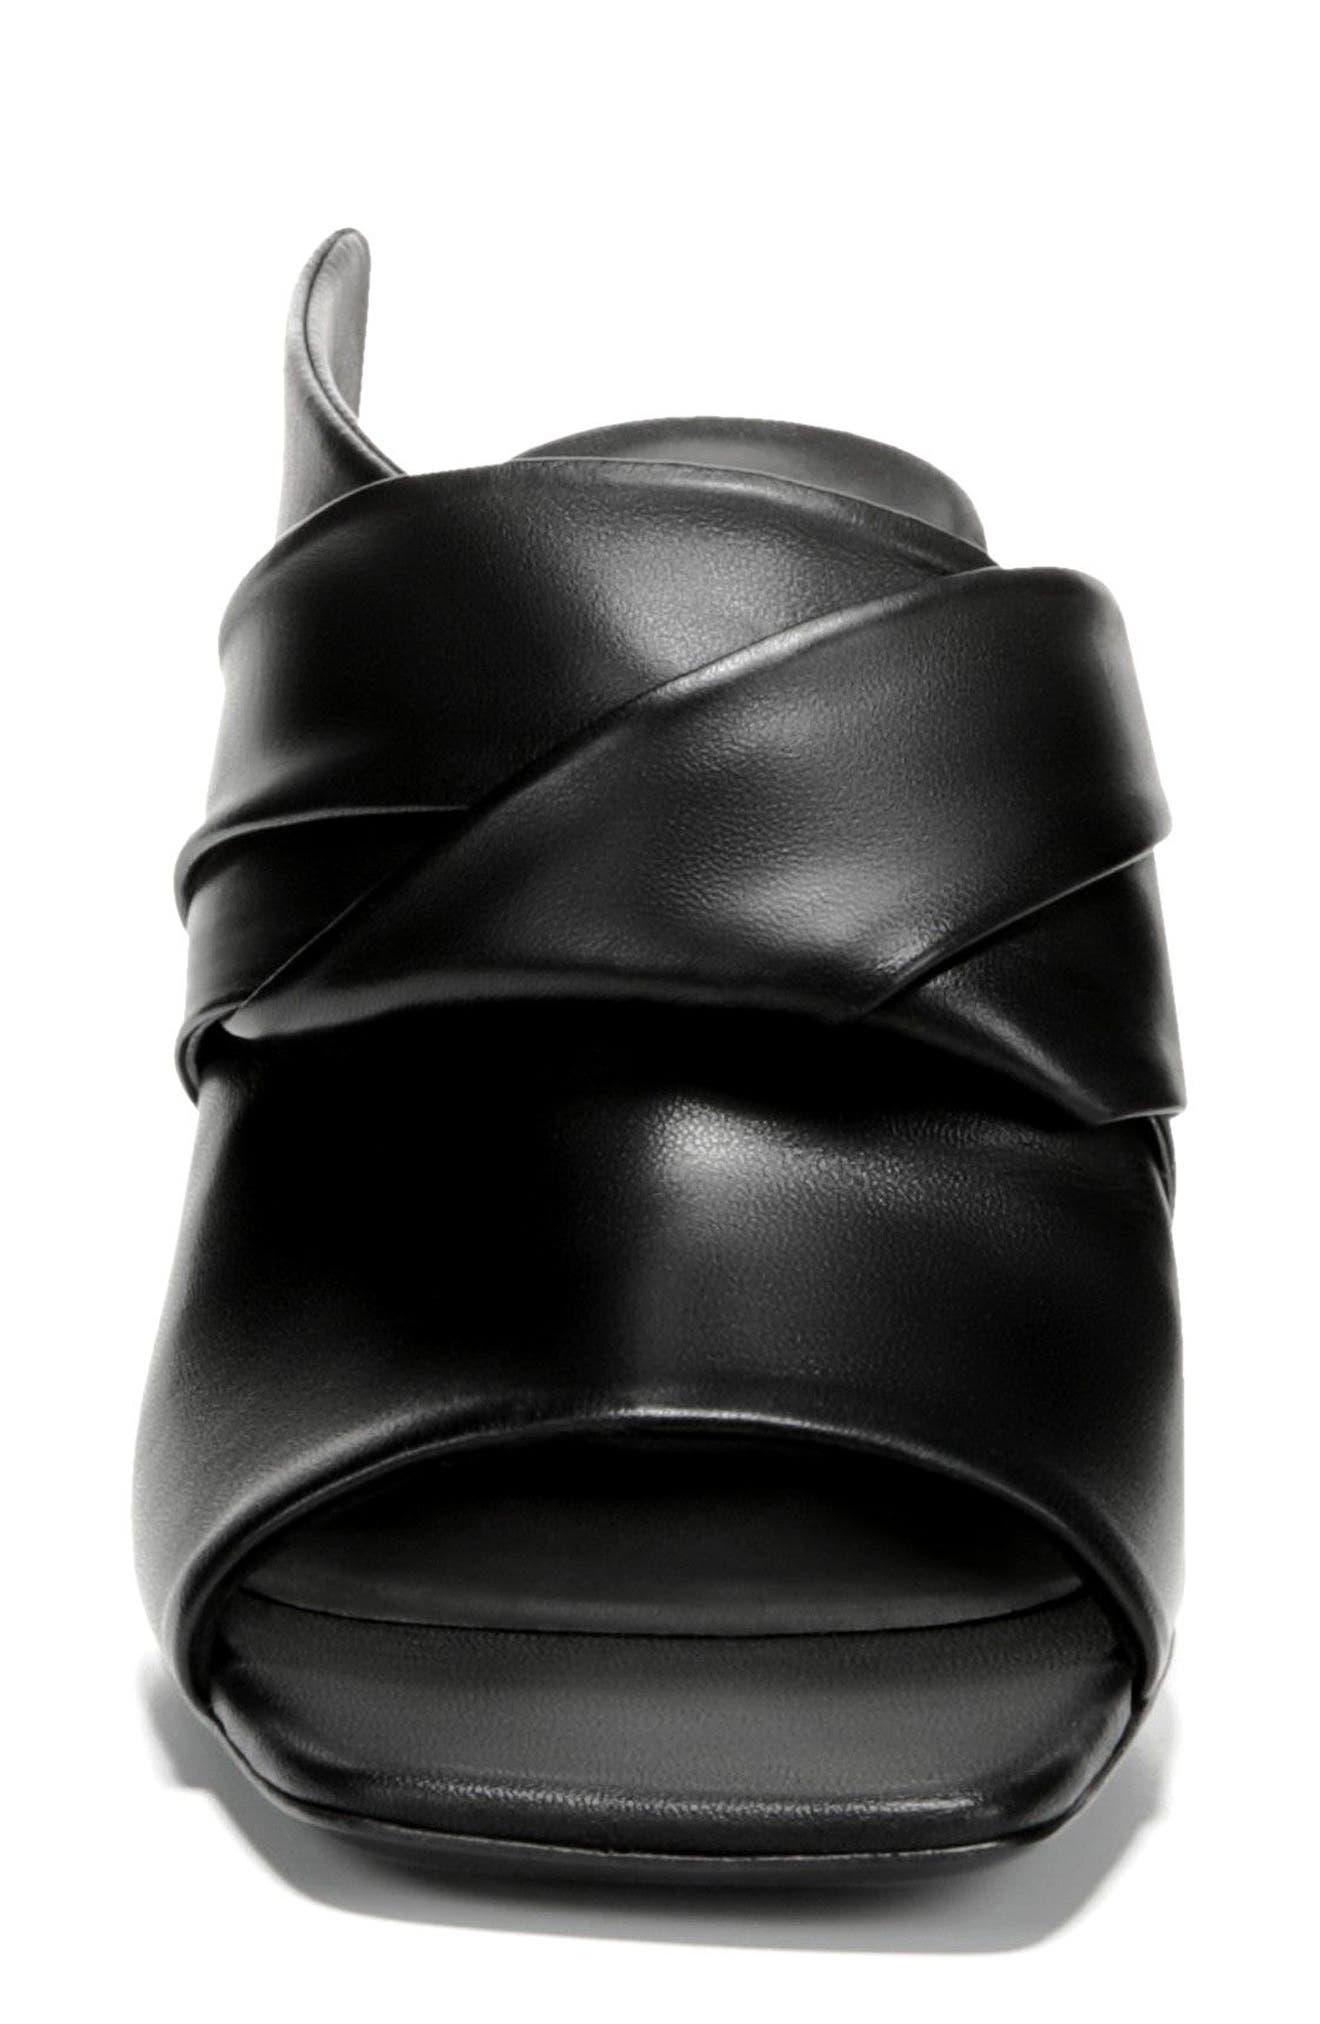 Elly Peep Toe Mule,                             Alternate thumbnail 4, color,                             BLACK LEATHER